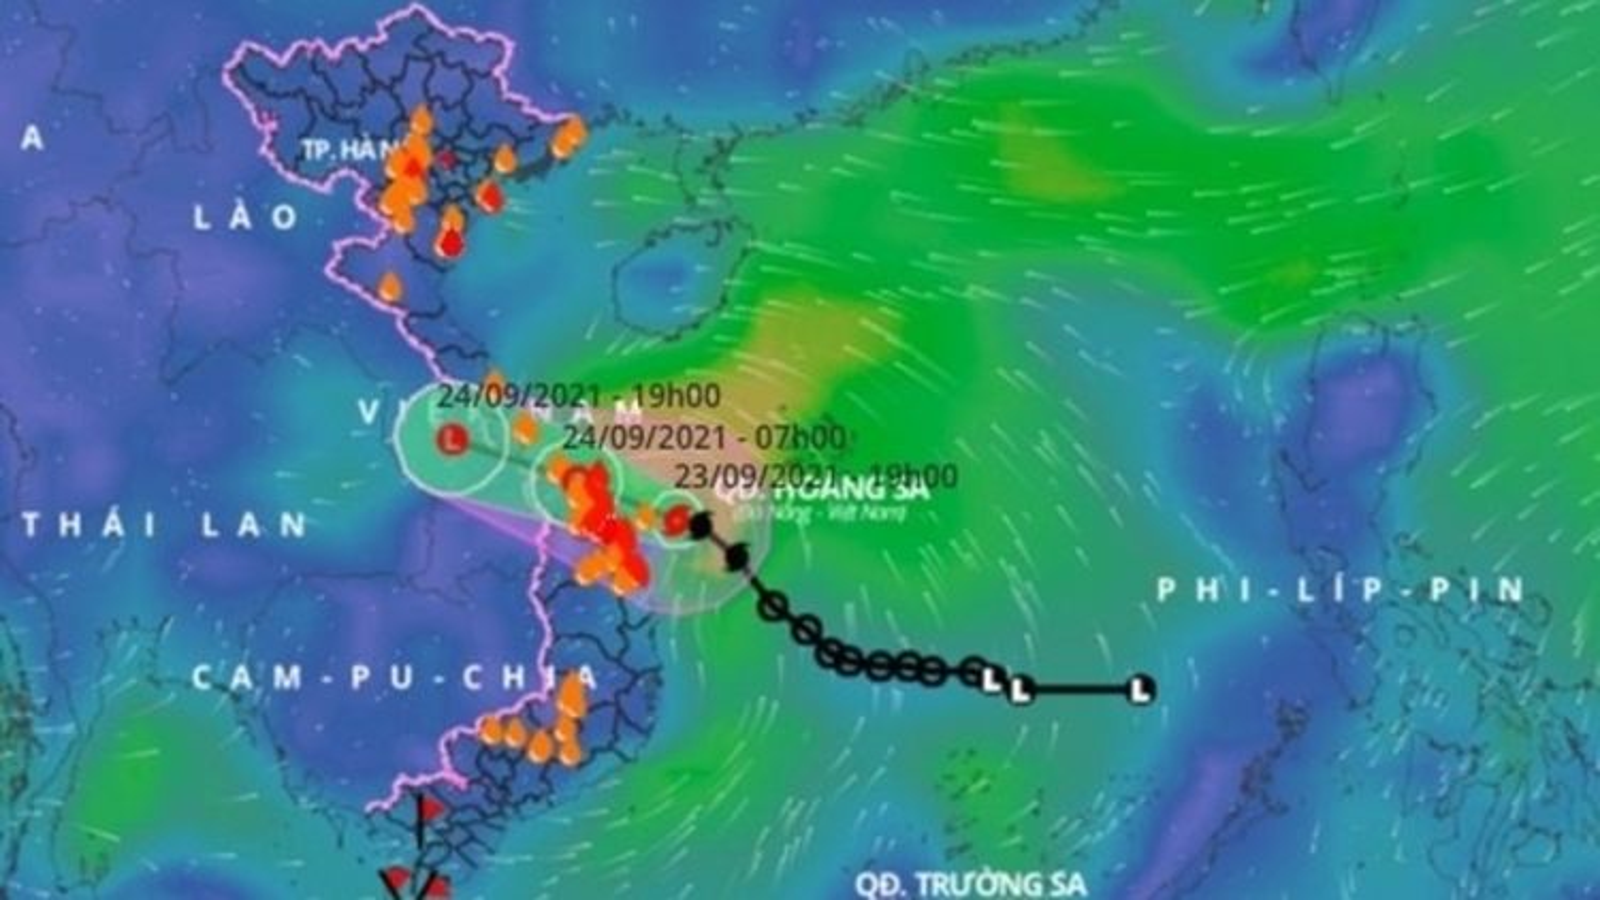 Dianmu weakens, heavy rain drenches central Vietnam